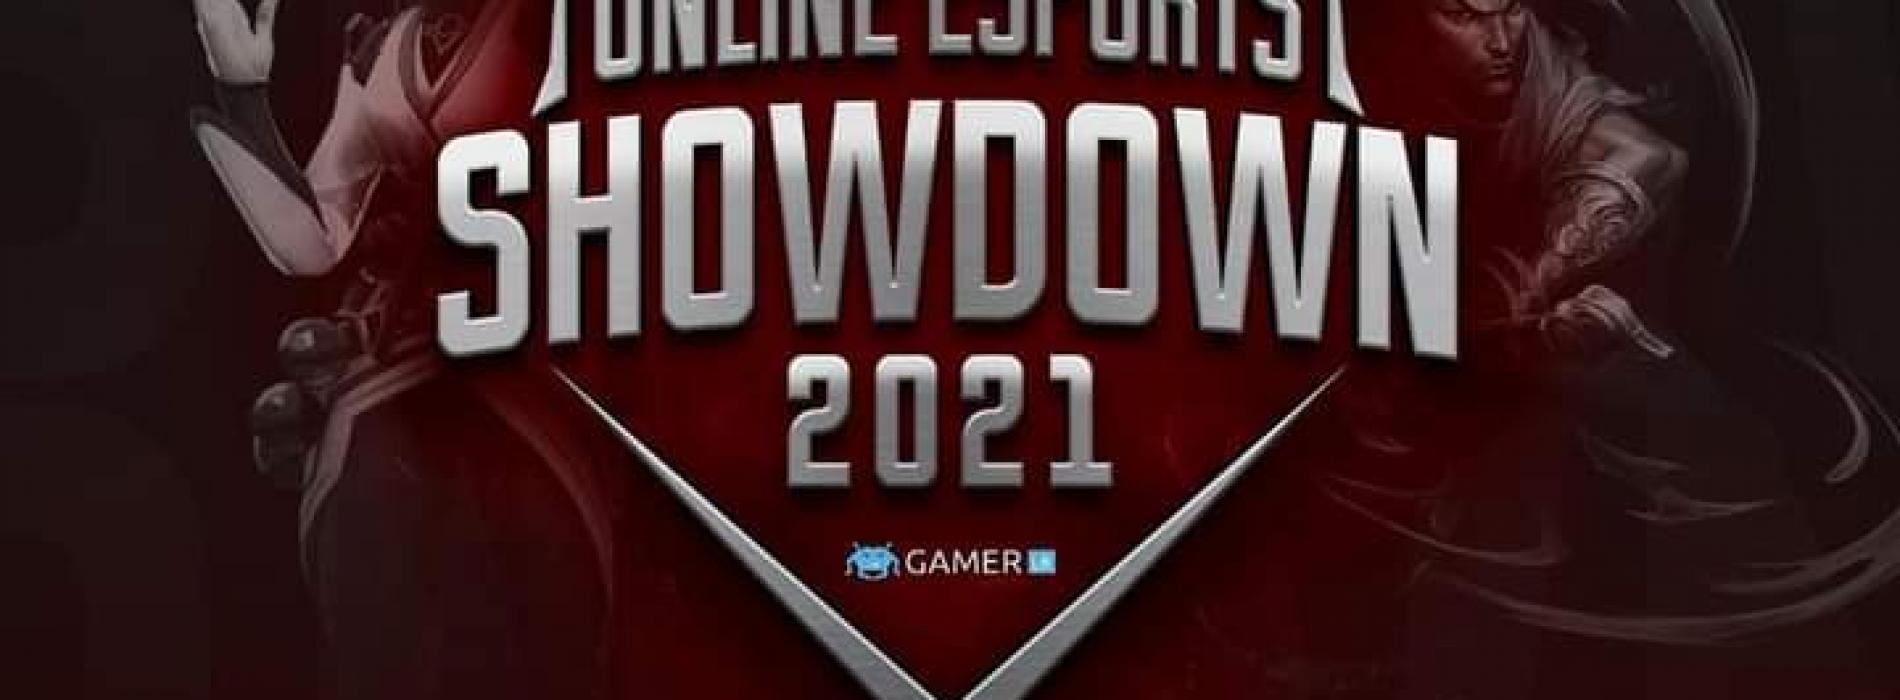 "3000+ Participants for the ""Online eSports Showdown 2021"""